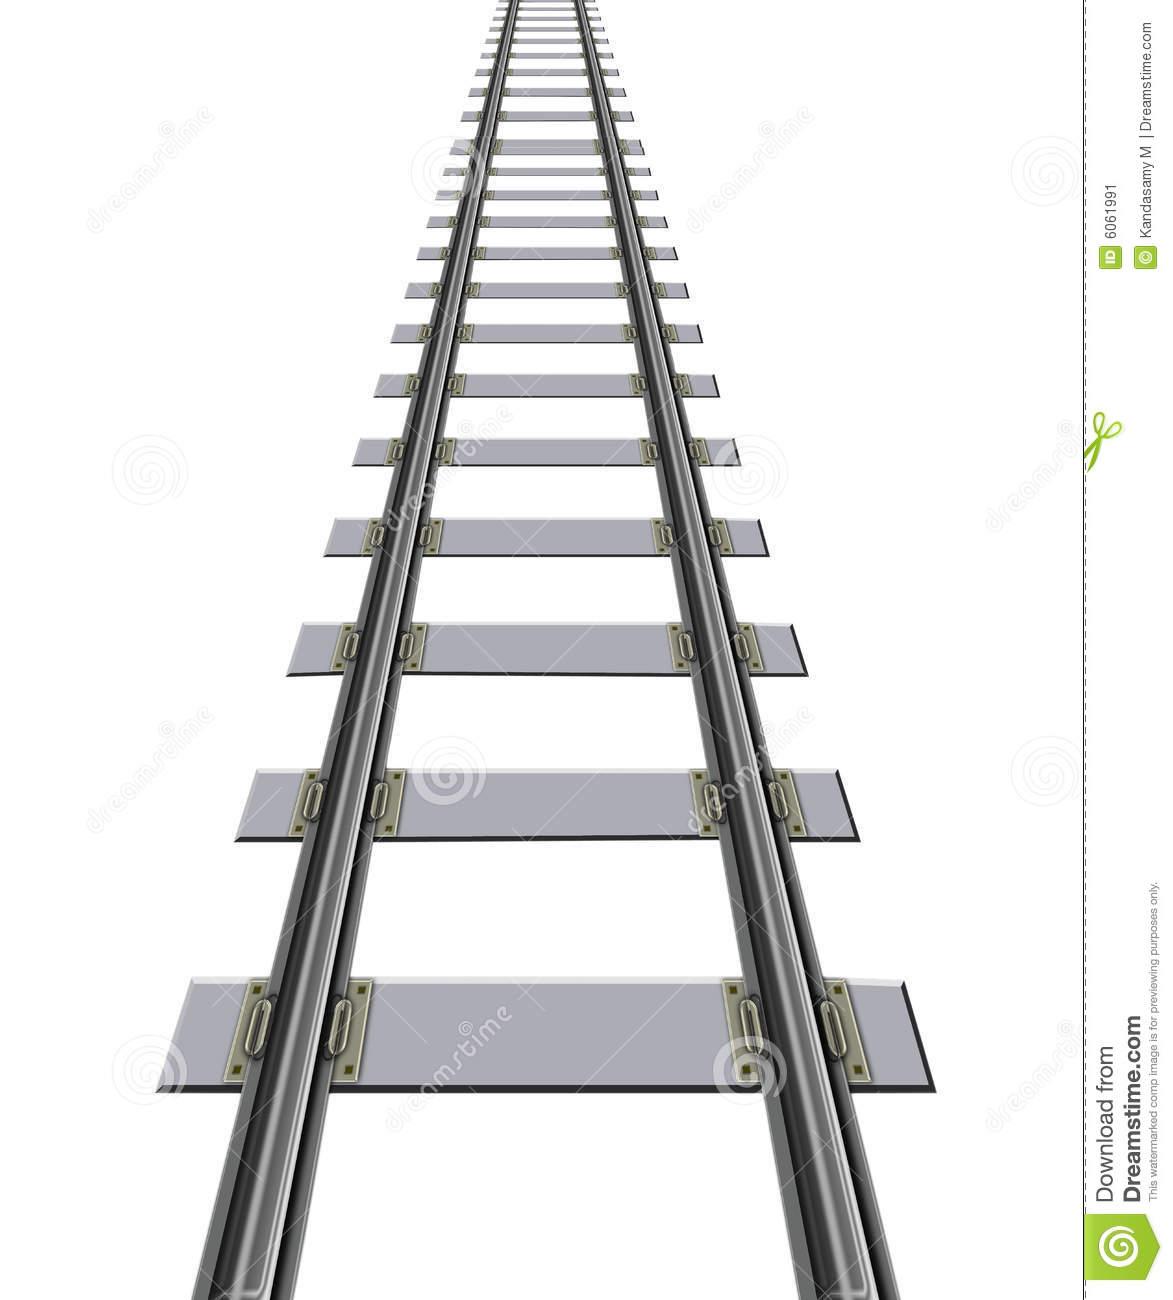 Clipart Train Tracks Free Download Wallpaper Hd #1837 - Train Track PNG HD